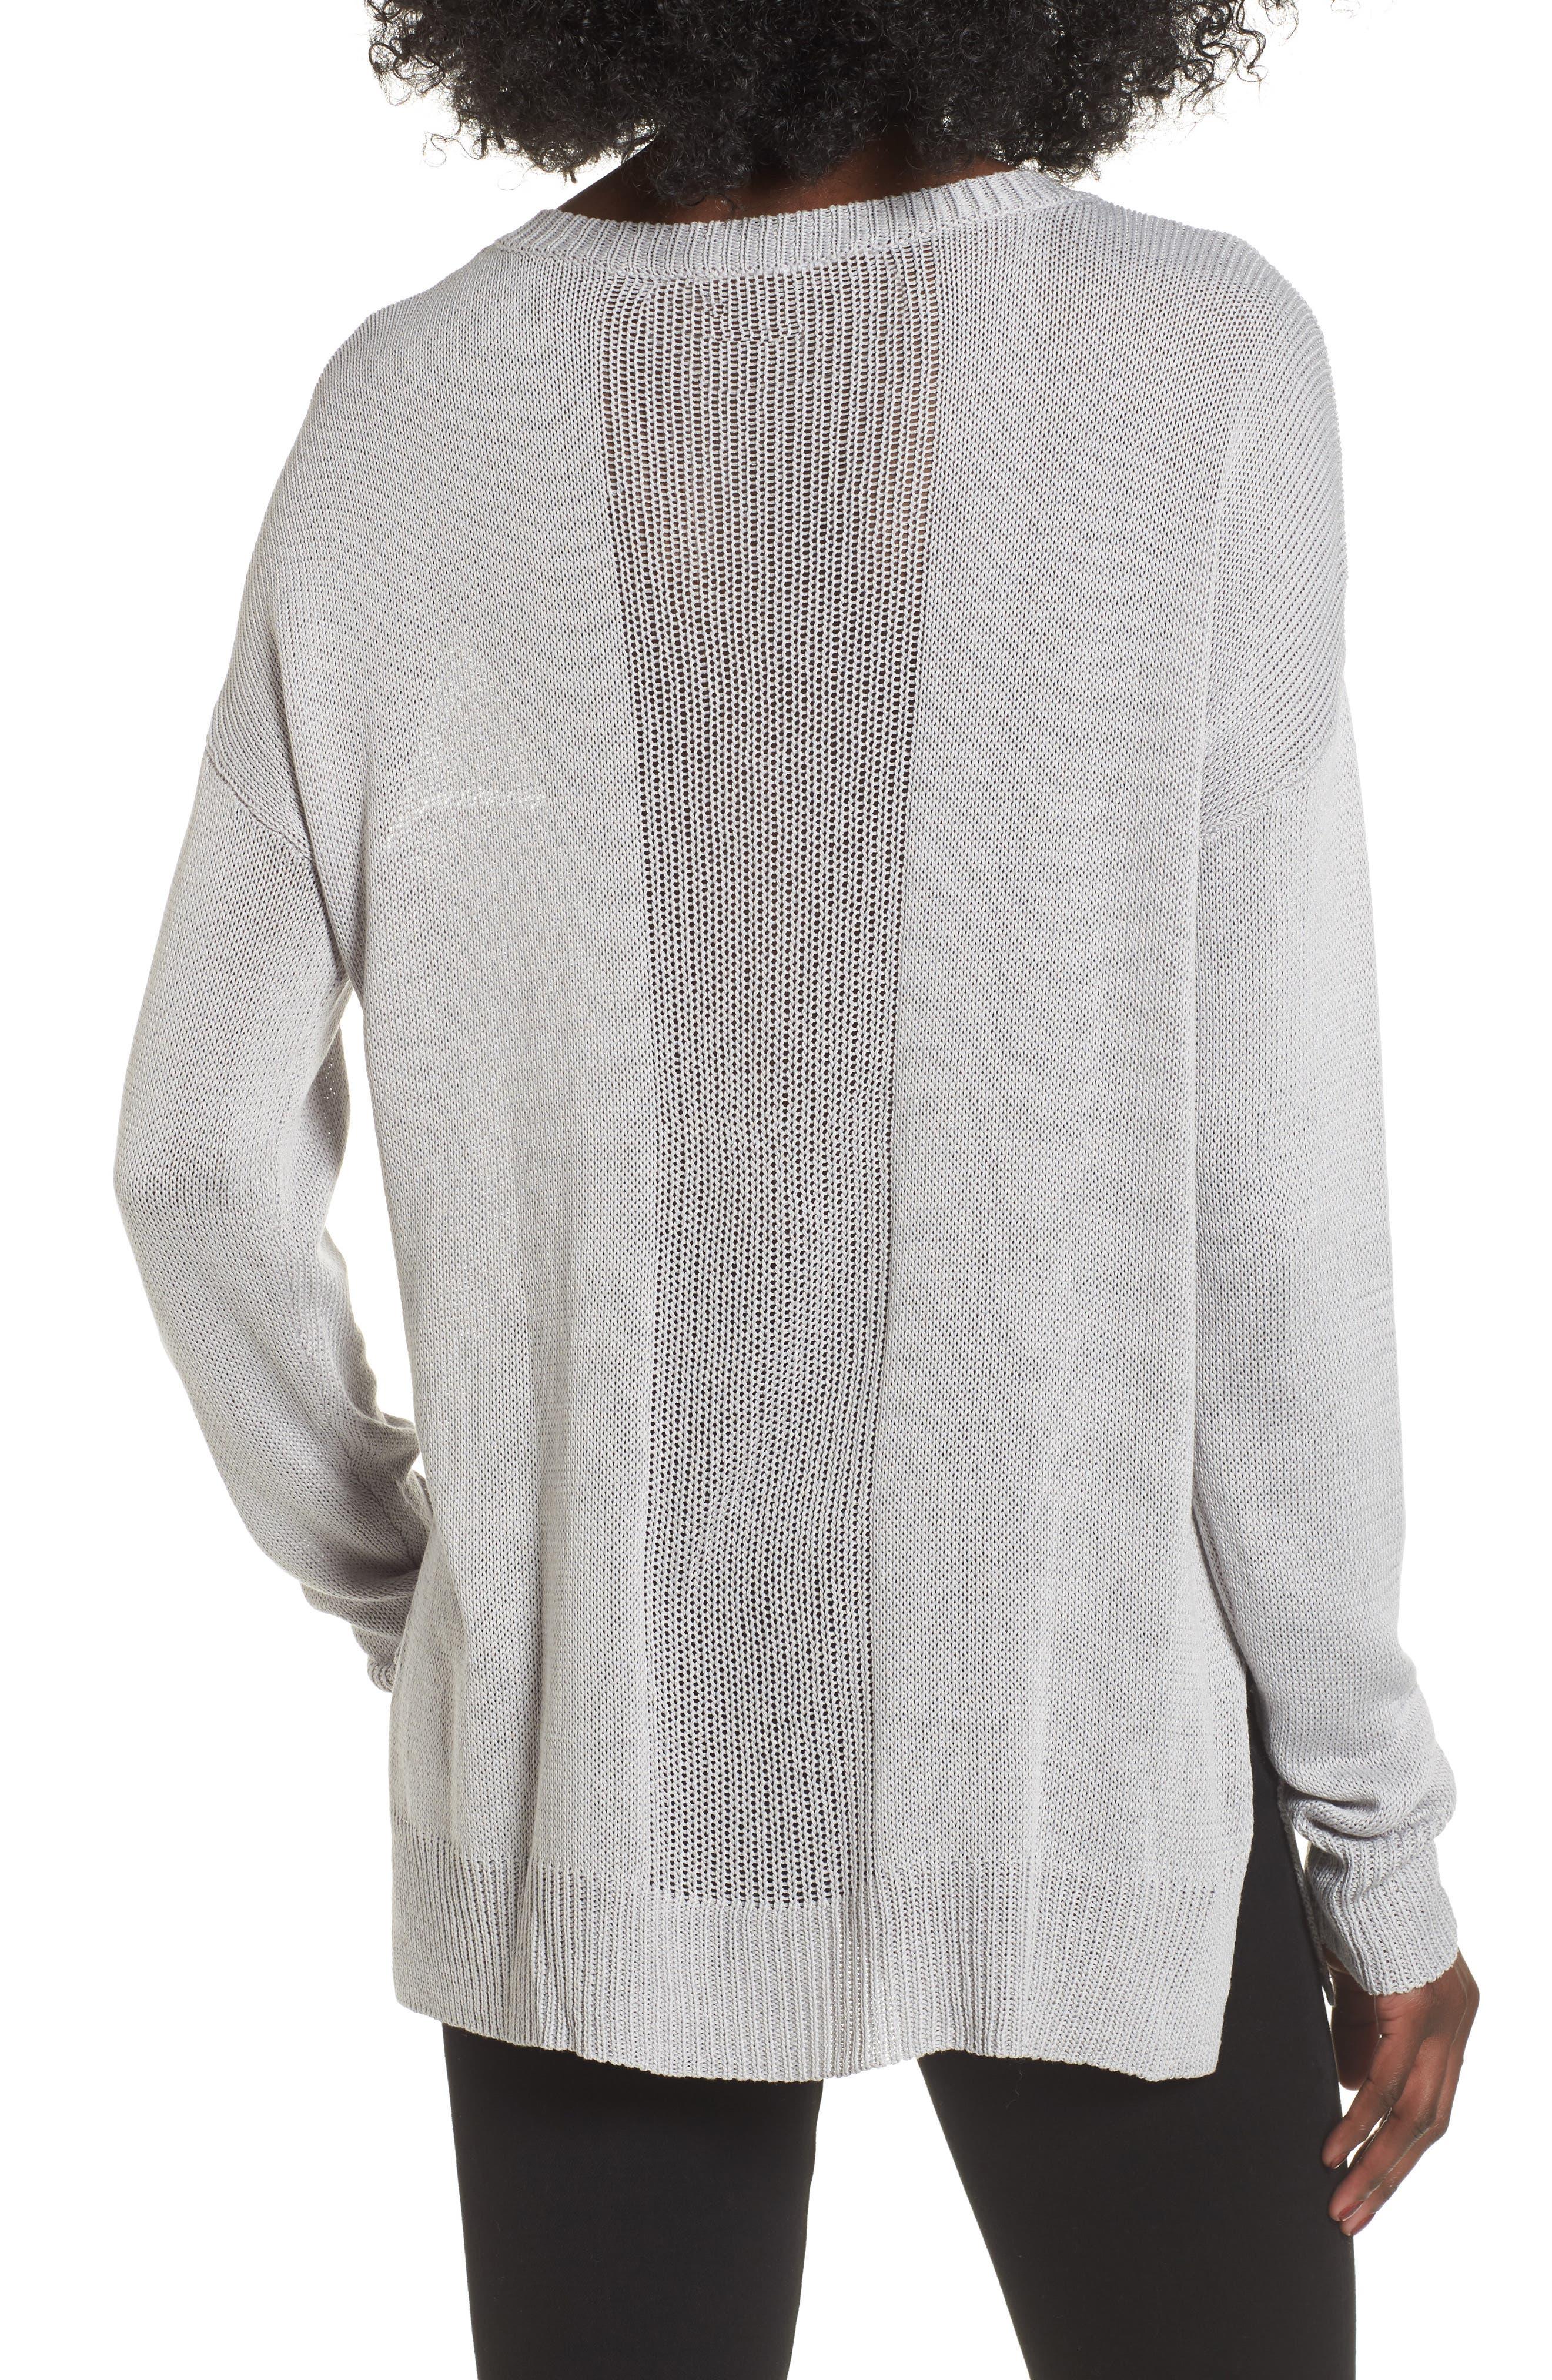 Open Lines V-Neck Sweater,                             Alternate thumbnail 2, color,                             020